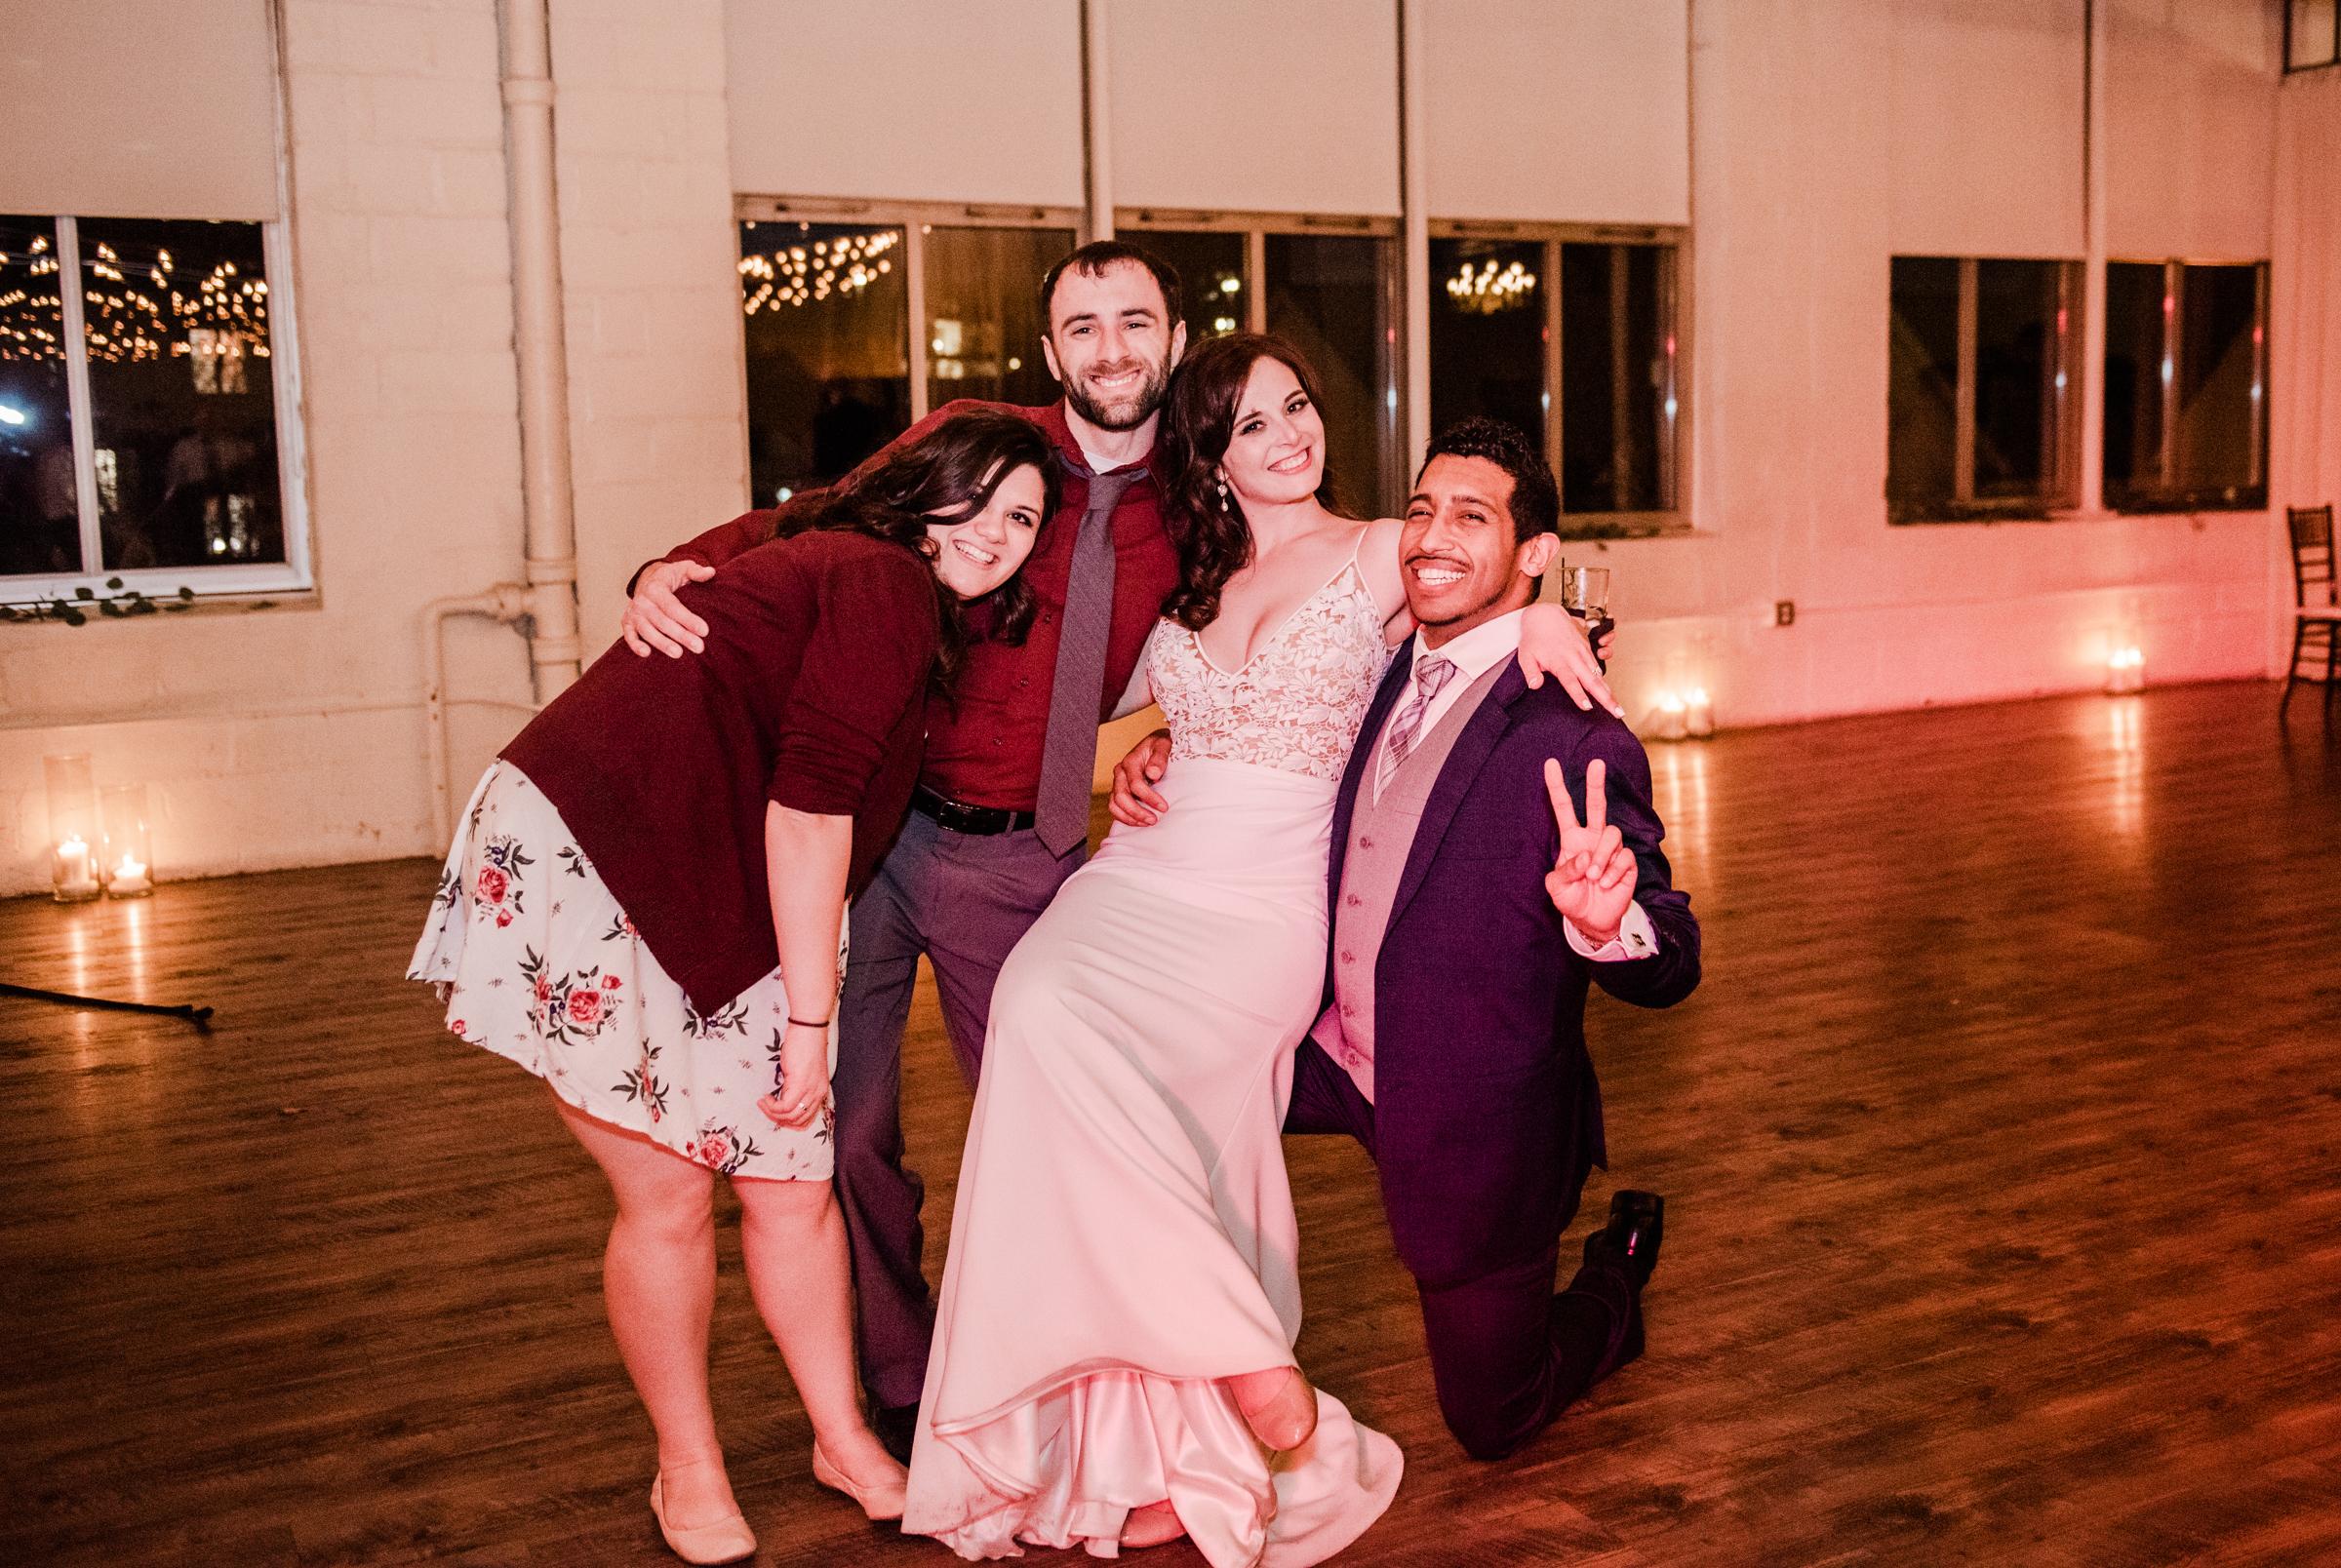 The_Arbor_LoftRochester_Wedding_JILL_STUDIO_Rochester_NY_Photographer_204120.jpg